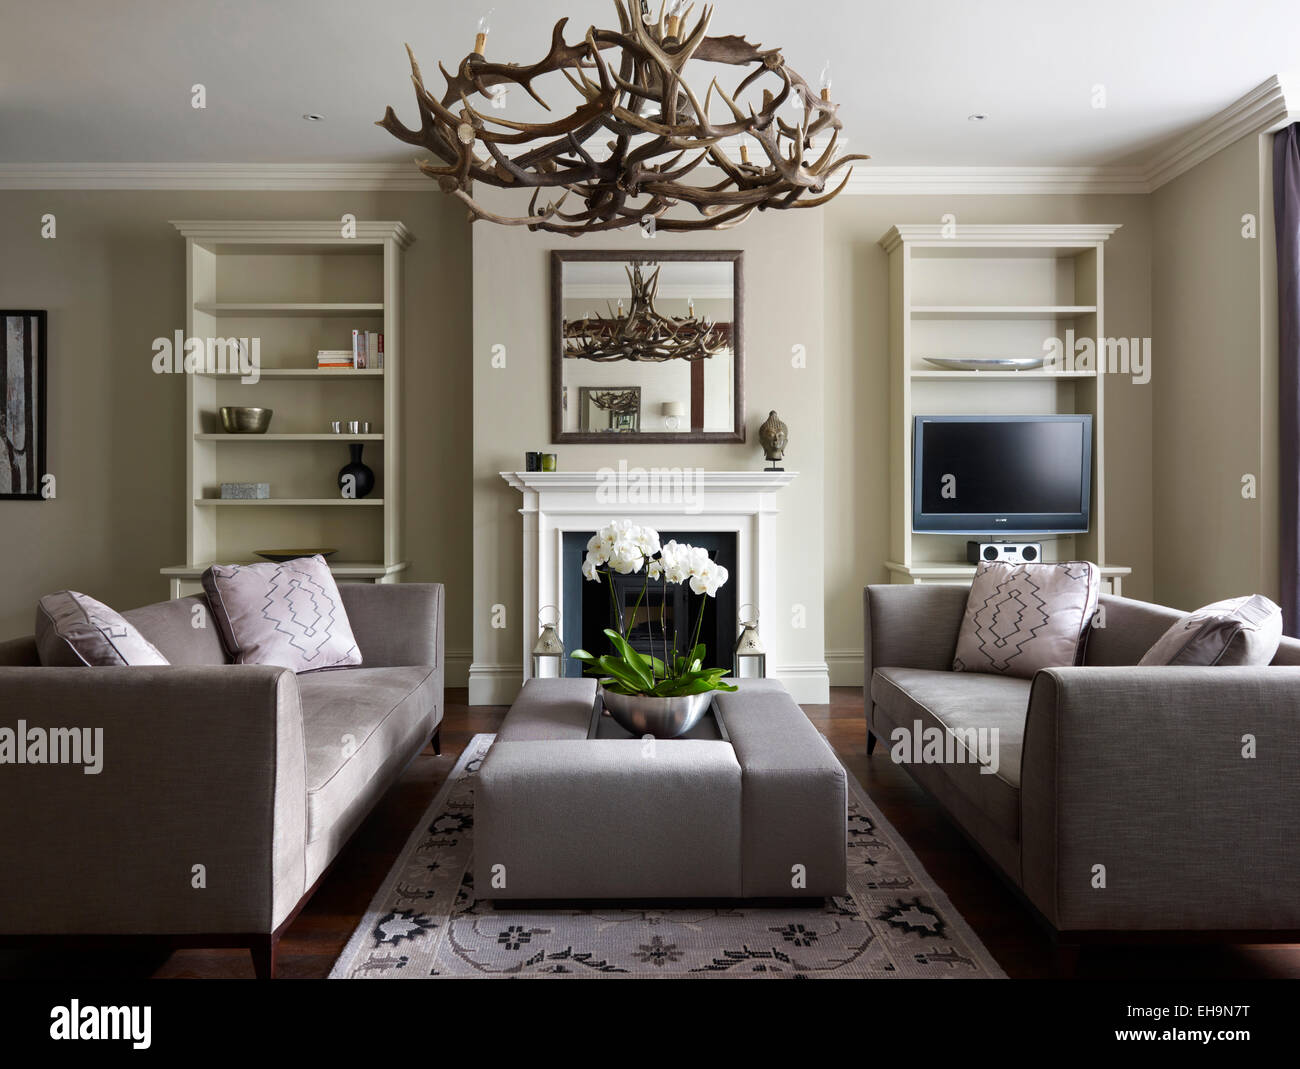 lighting for bookshelves. Modern Lounge With Sofas, Bookshelves And Antler Lighting Fixture Reflection In Mounted Mirror Stevenage Road Home, UK For